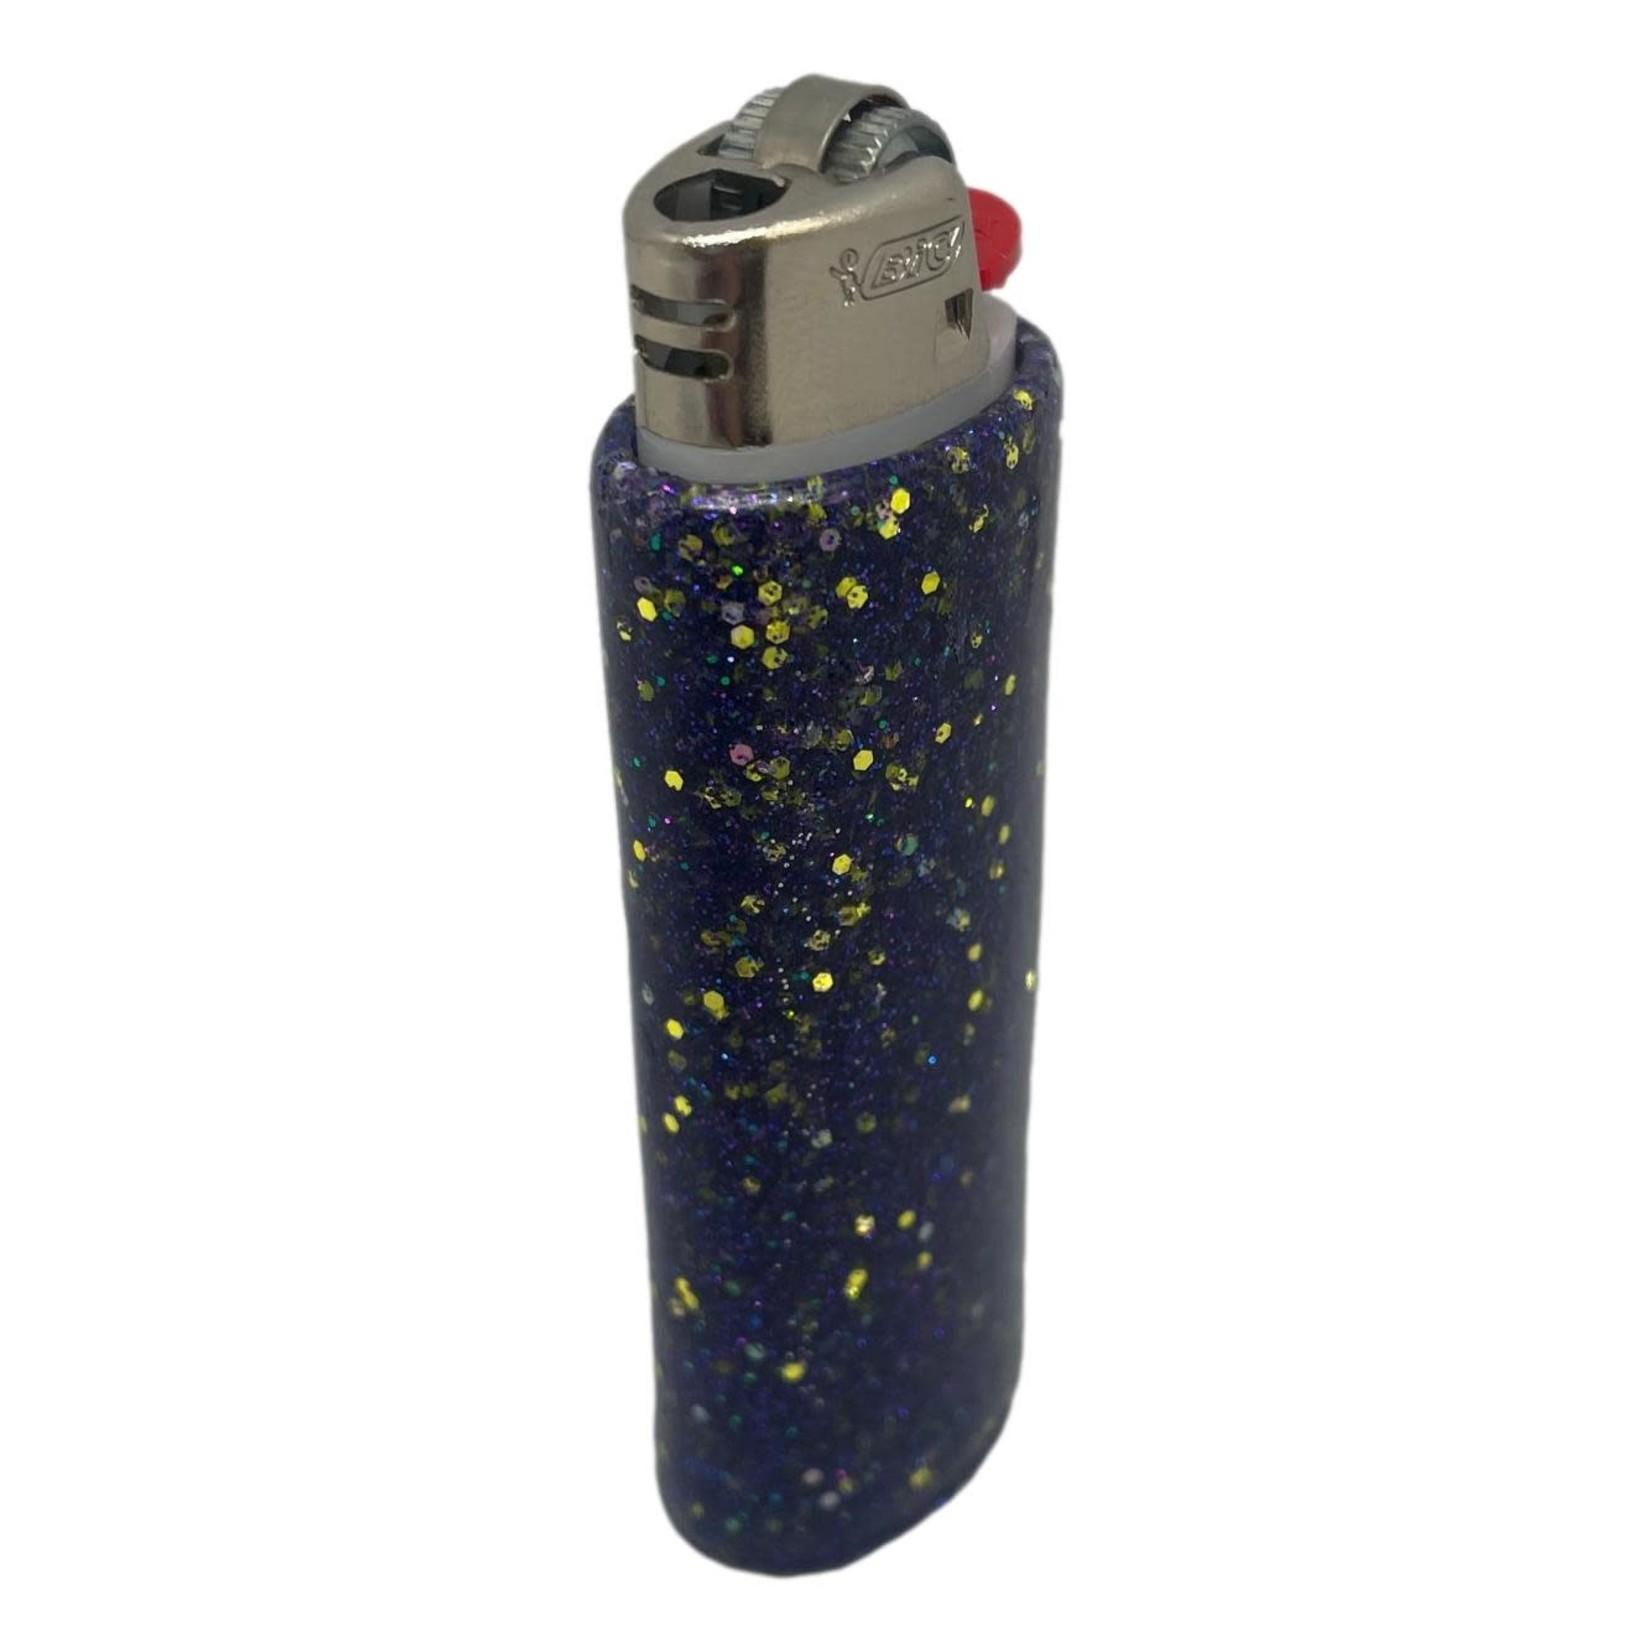 East Coast Sirens Purple Glitter Lighter Case (Small)